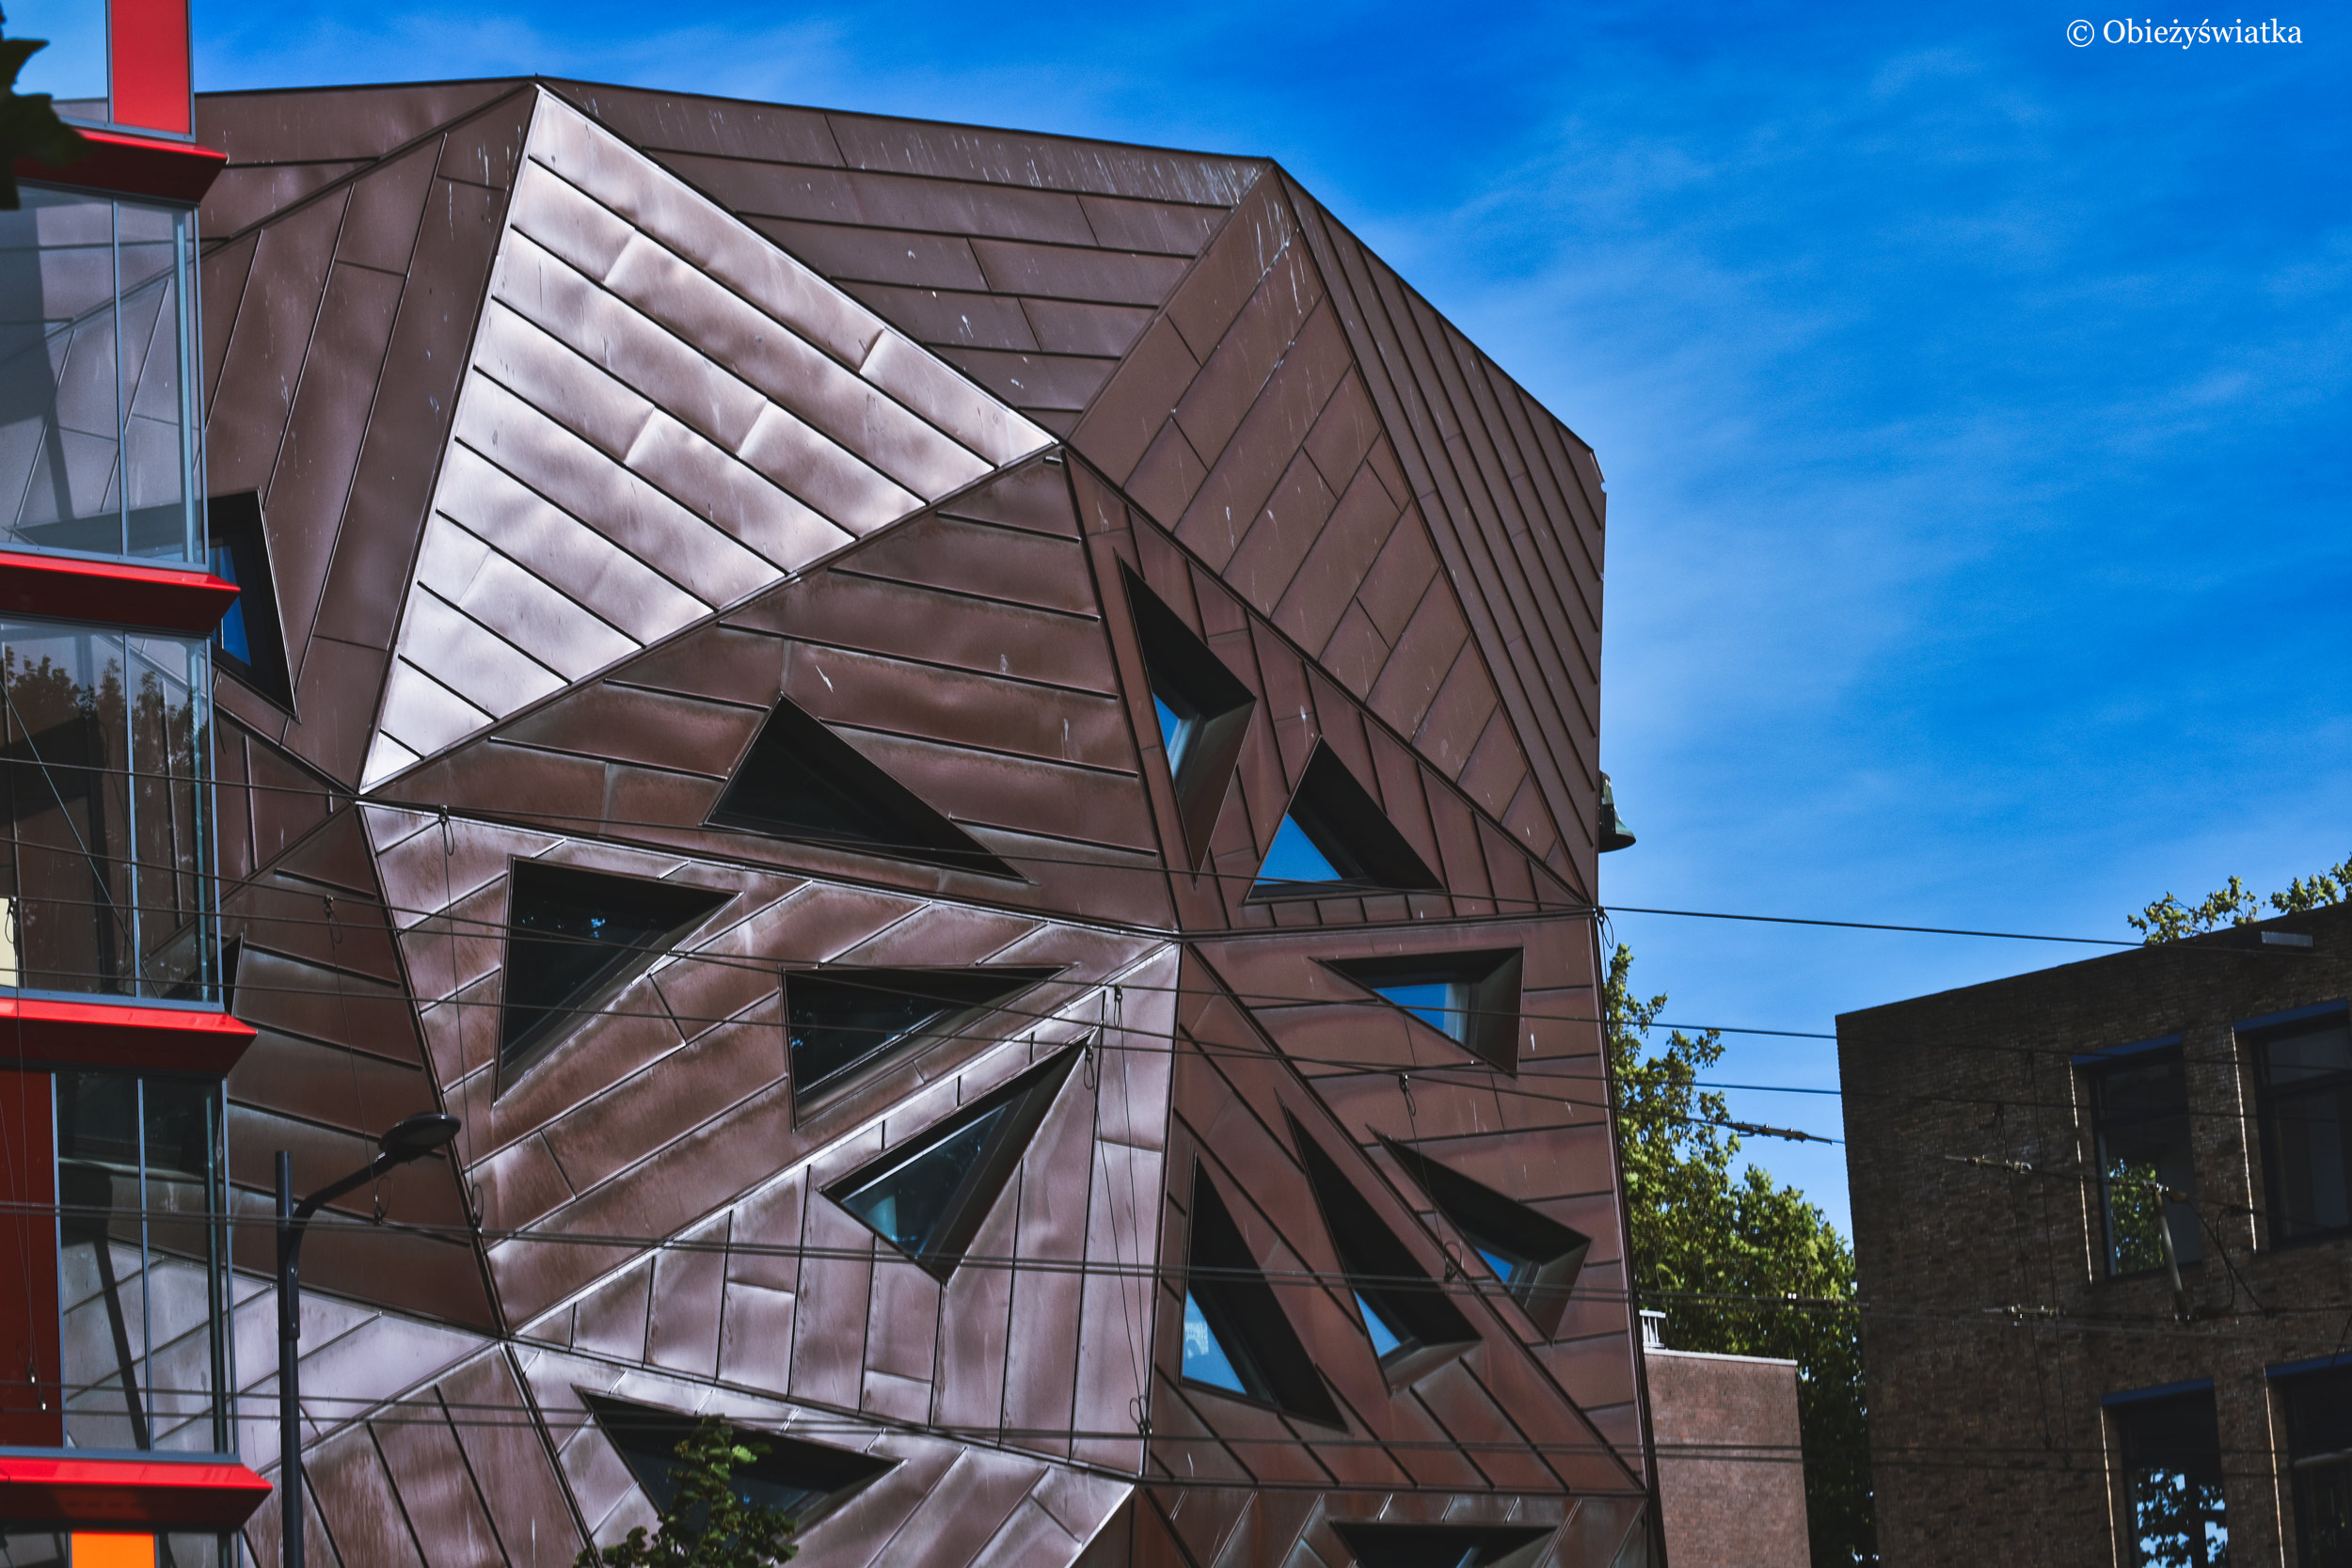 Futurystyczny kościół - Pauluskerk w kompleksie Calypso, Rotterdam